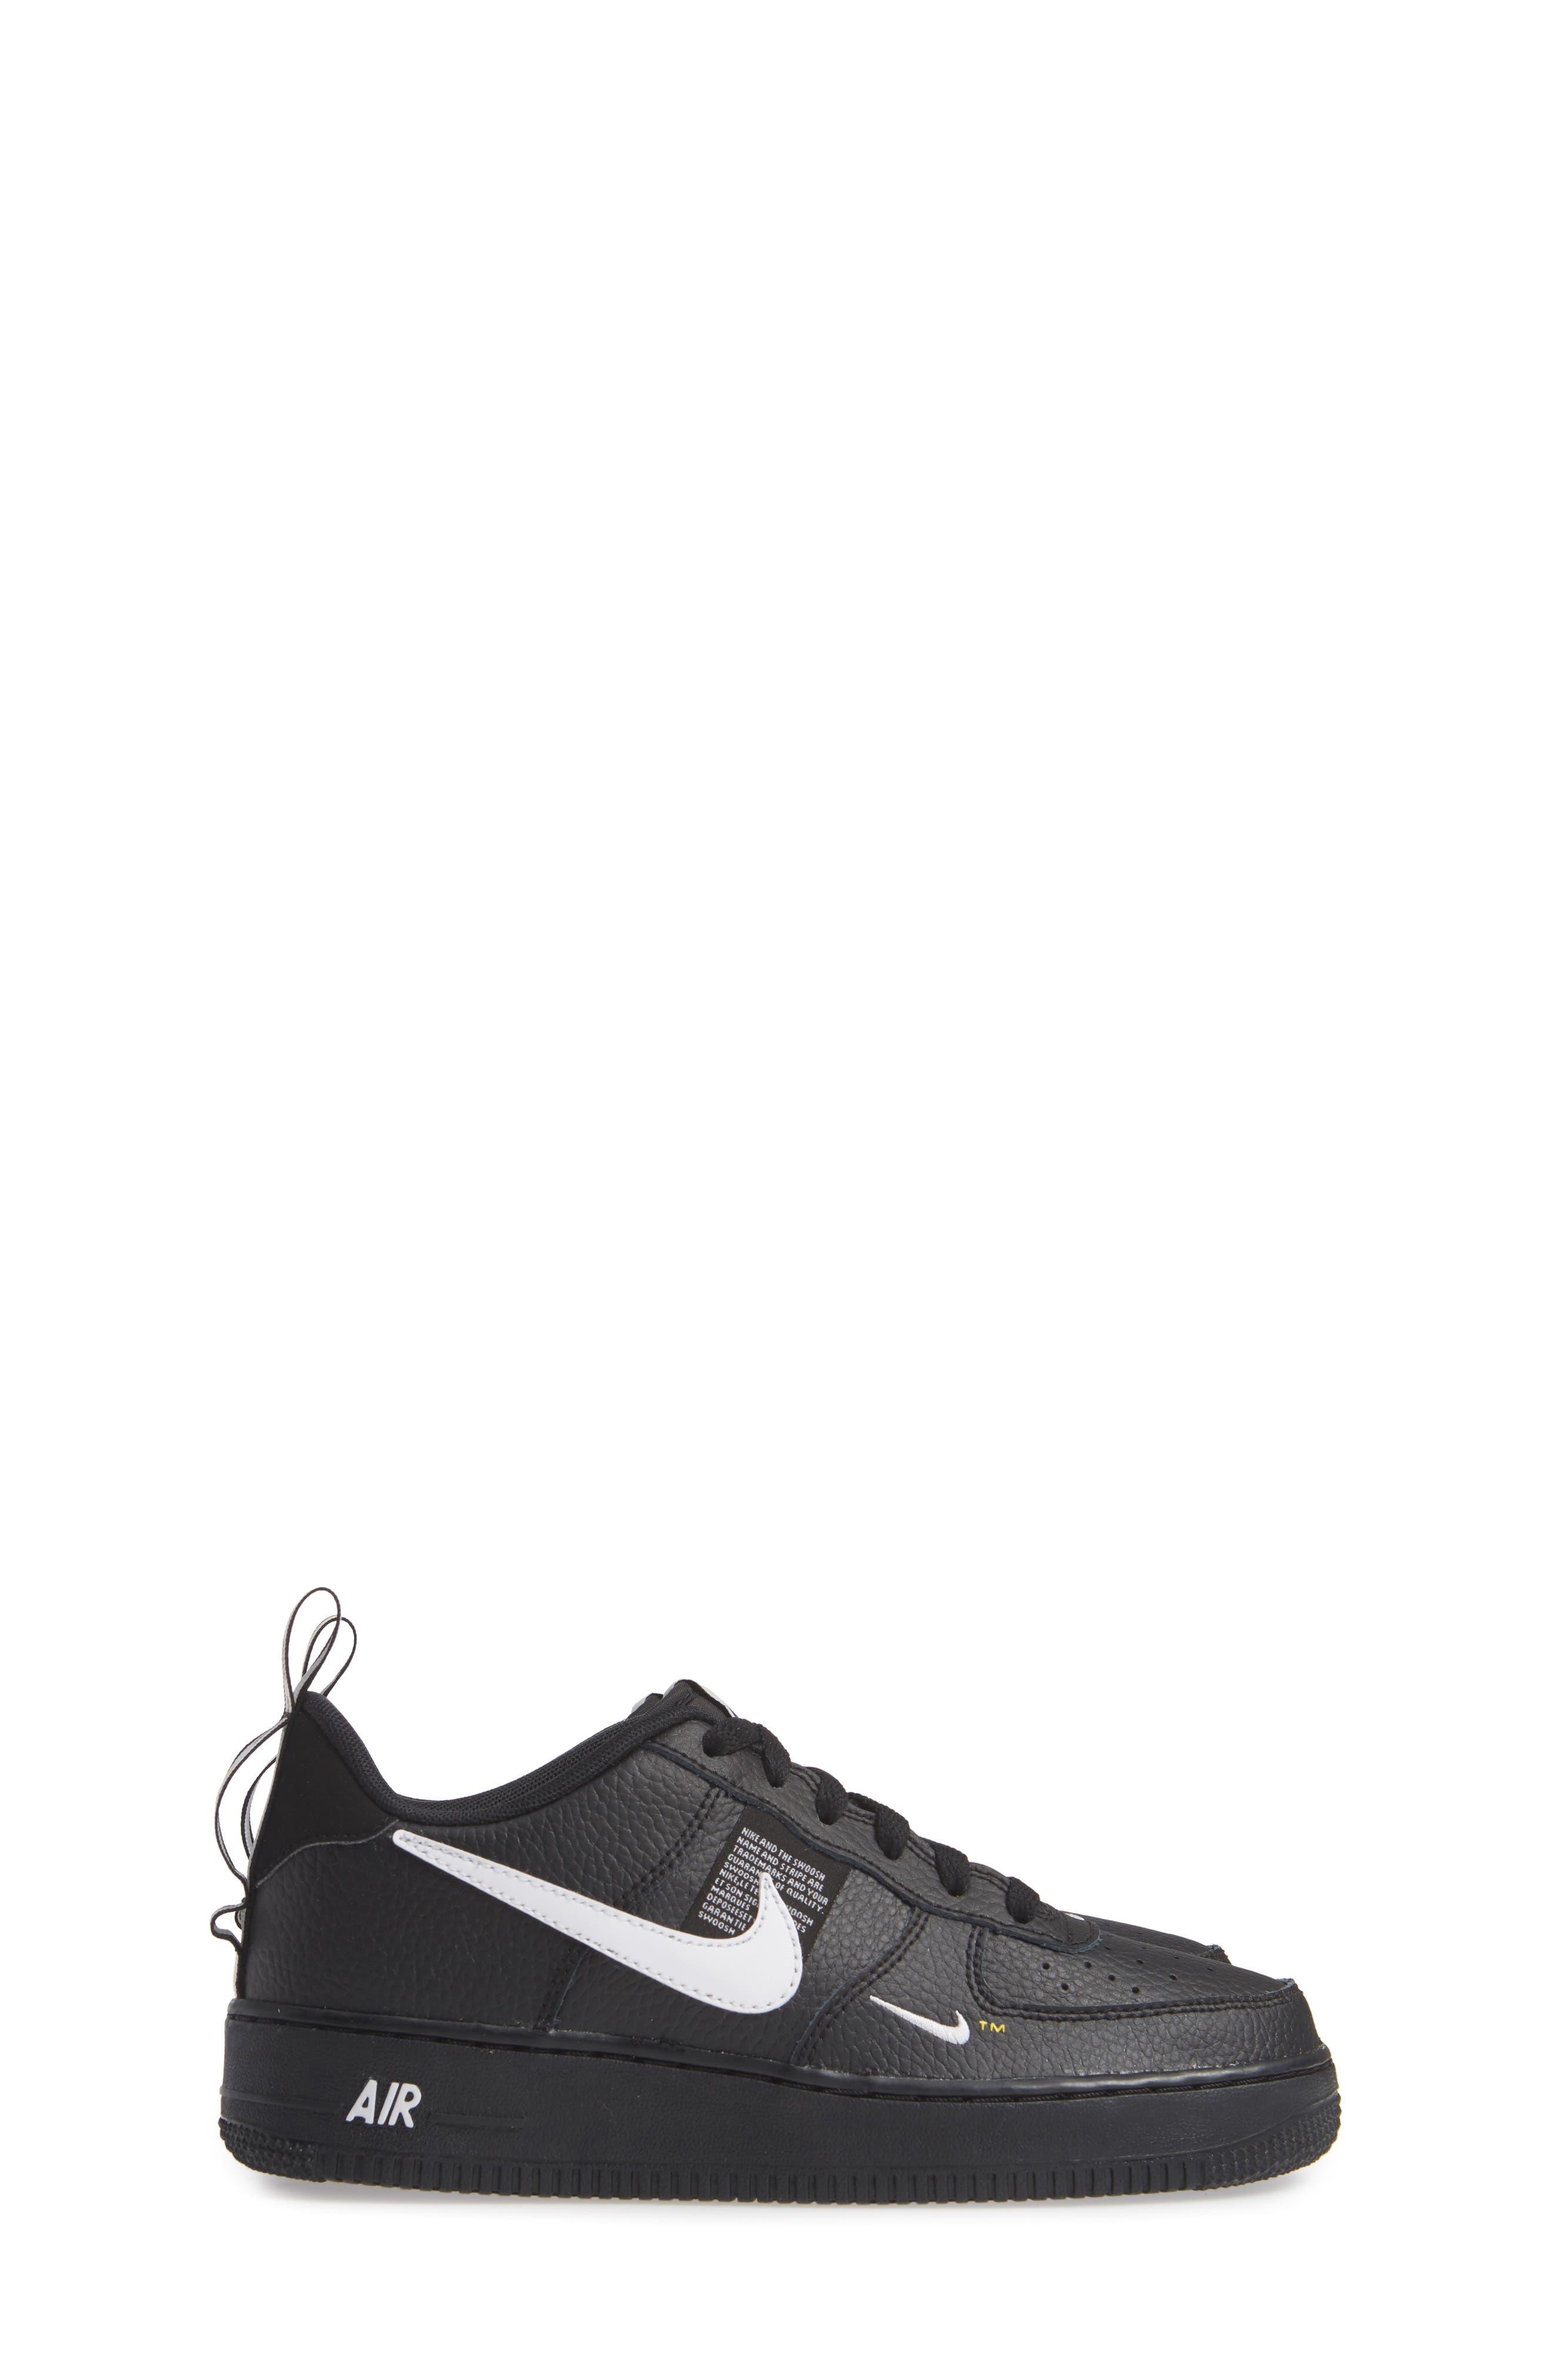 NIKE,                             Air Force 1 LV8 Sneaker,                             Alternate thumbnail 4, color,                             BLACK/ WHITE-BLACK-TOUR YELLOW